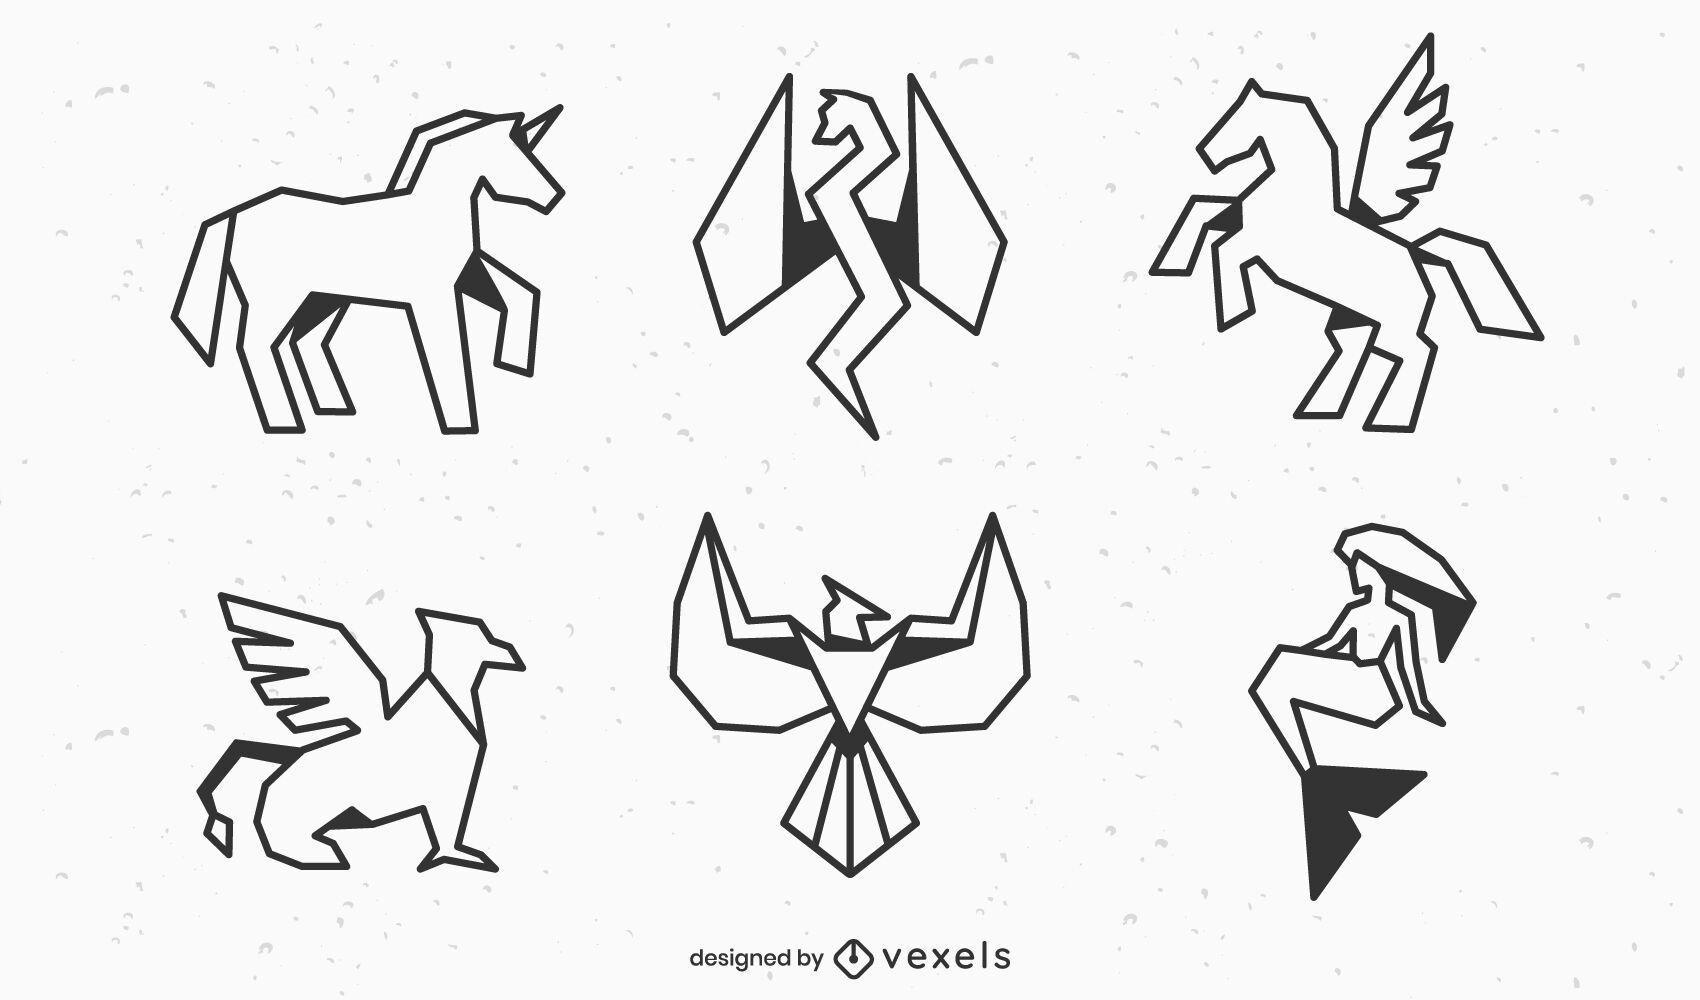 Geometric mythical creatures stroke set